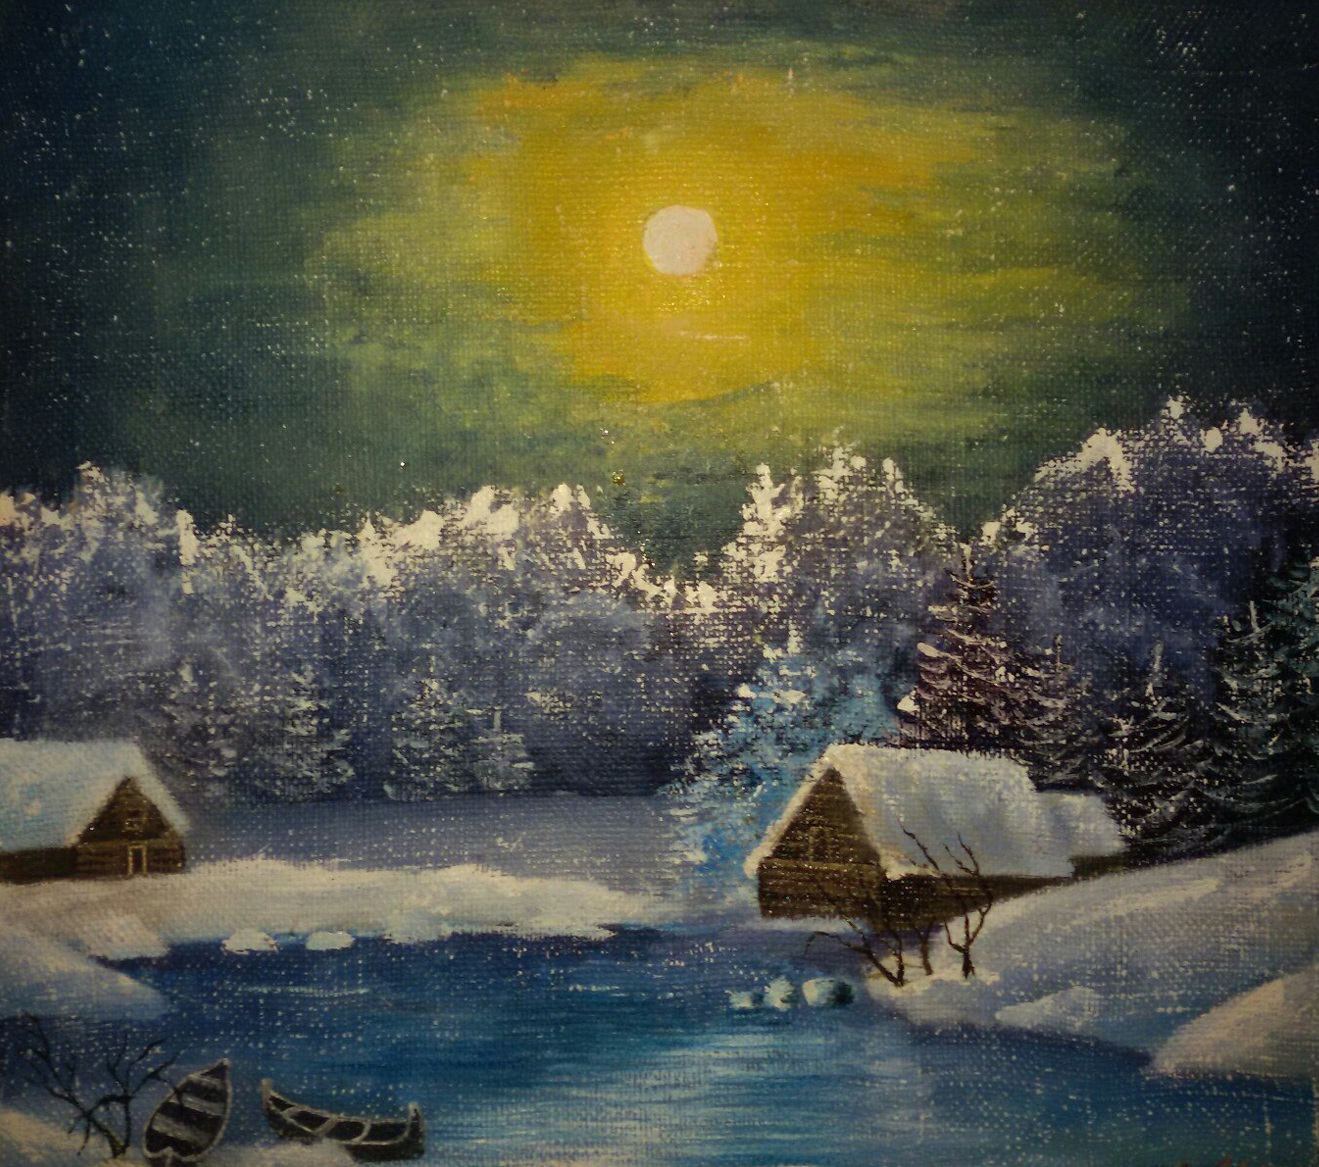 «Зимняя сказка», Александра Дубинина, холст, масло, 40х50 см, 2017 г.